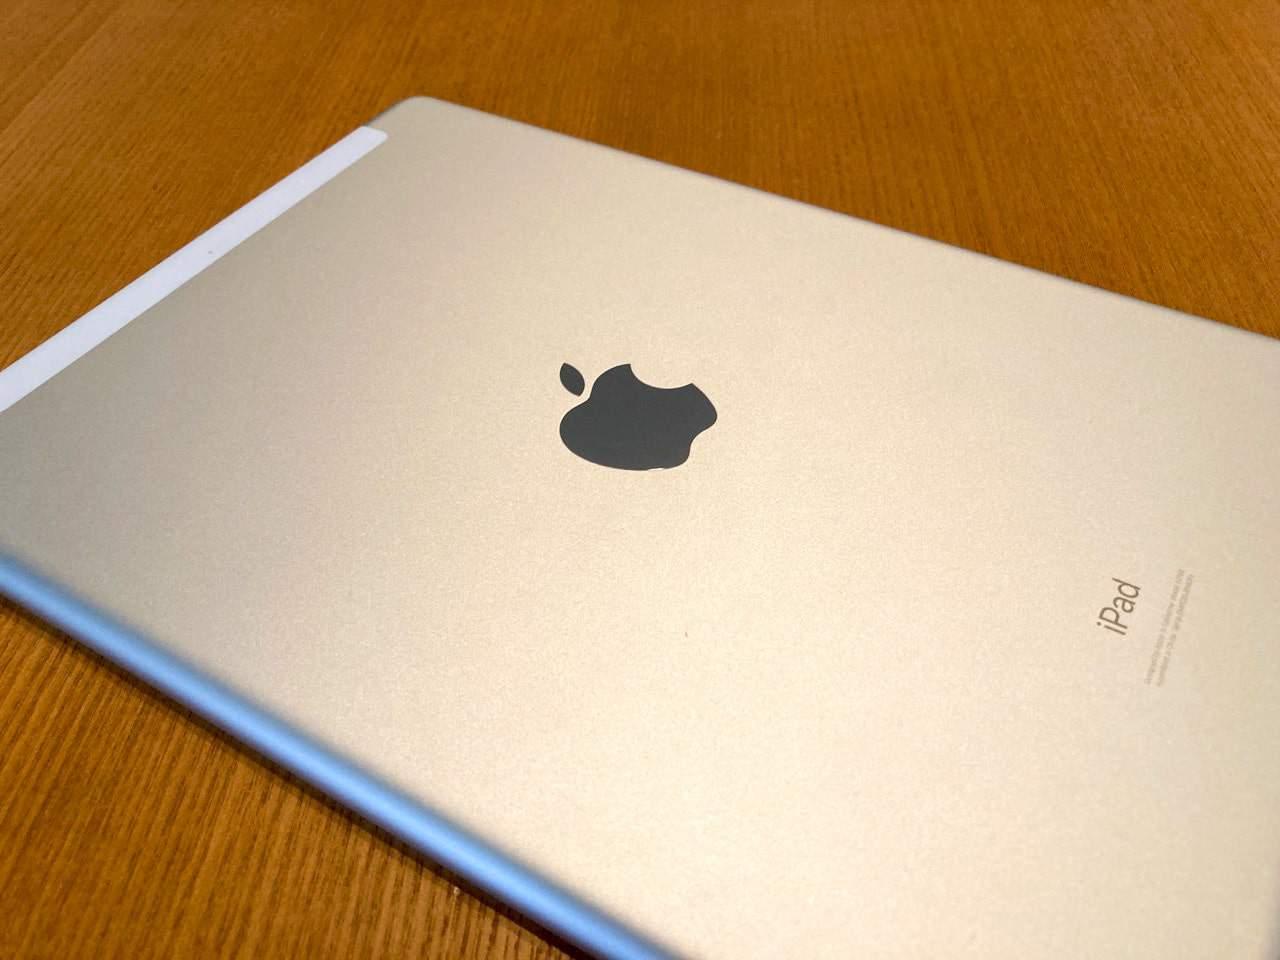 iPad第8世代、iPadAir第4世代の通信環境と電力のコントロール